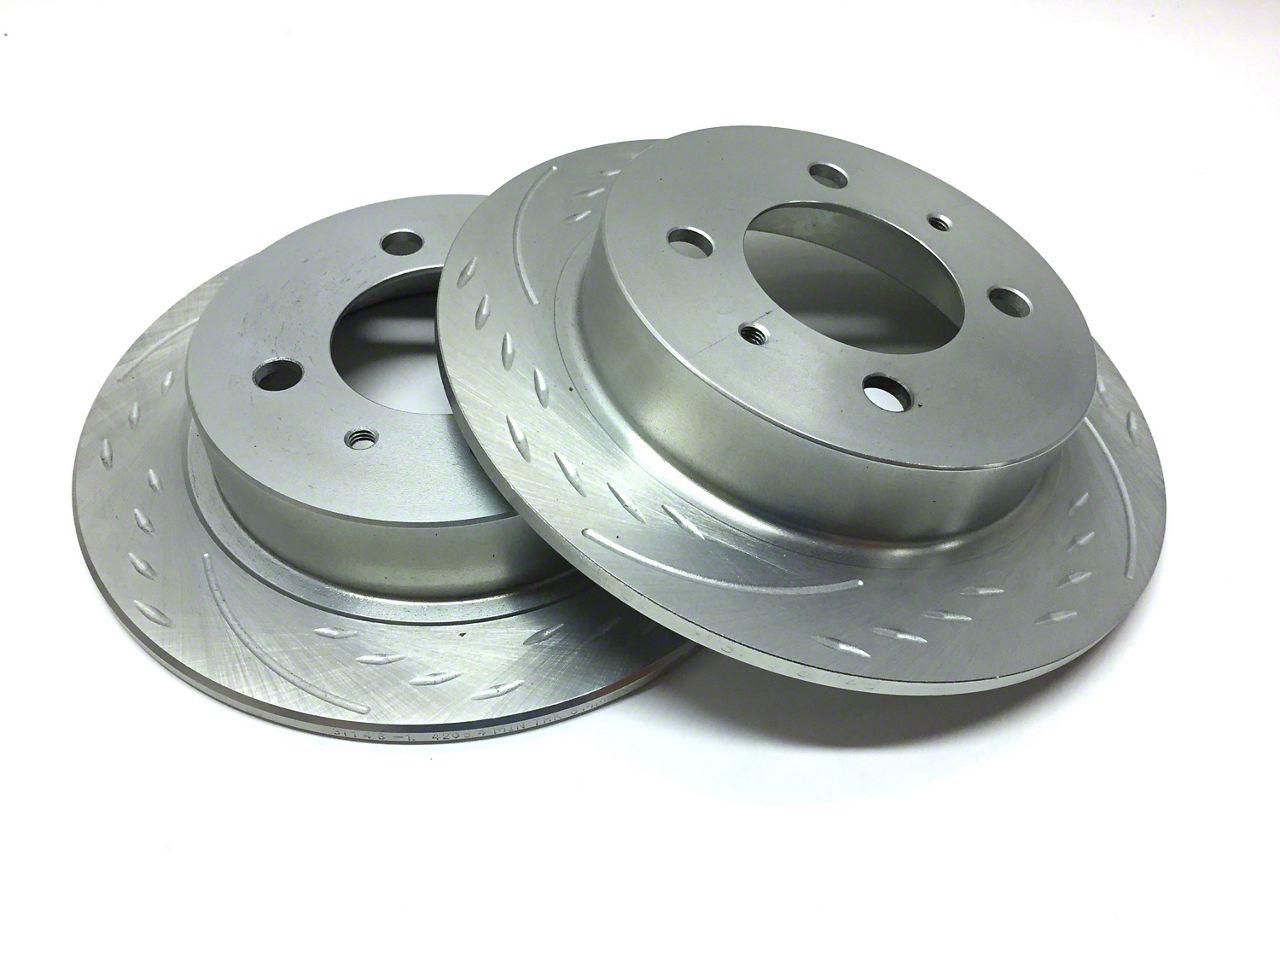 SP Performance Diamond Slot Rotors w/ Silver Zinc Plating - Rear Pair (15-19 GT, EcoBoost)